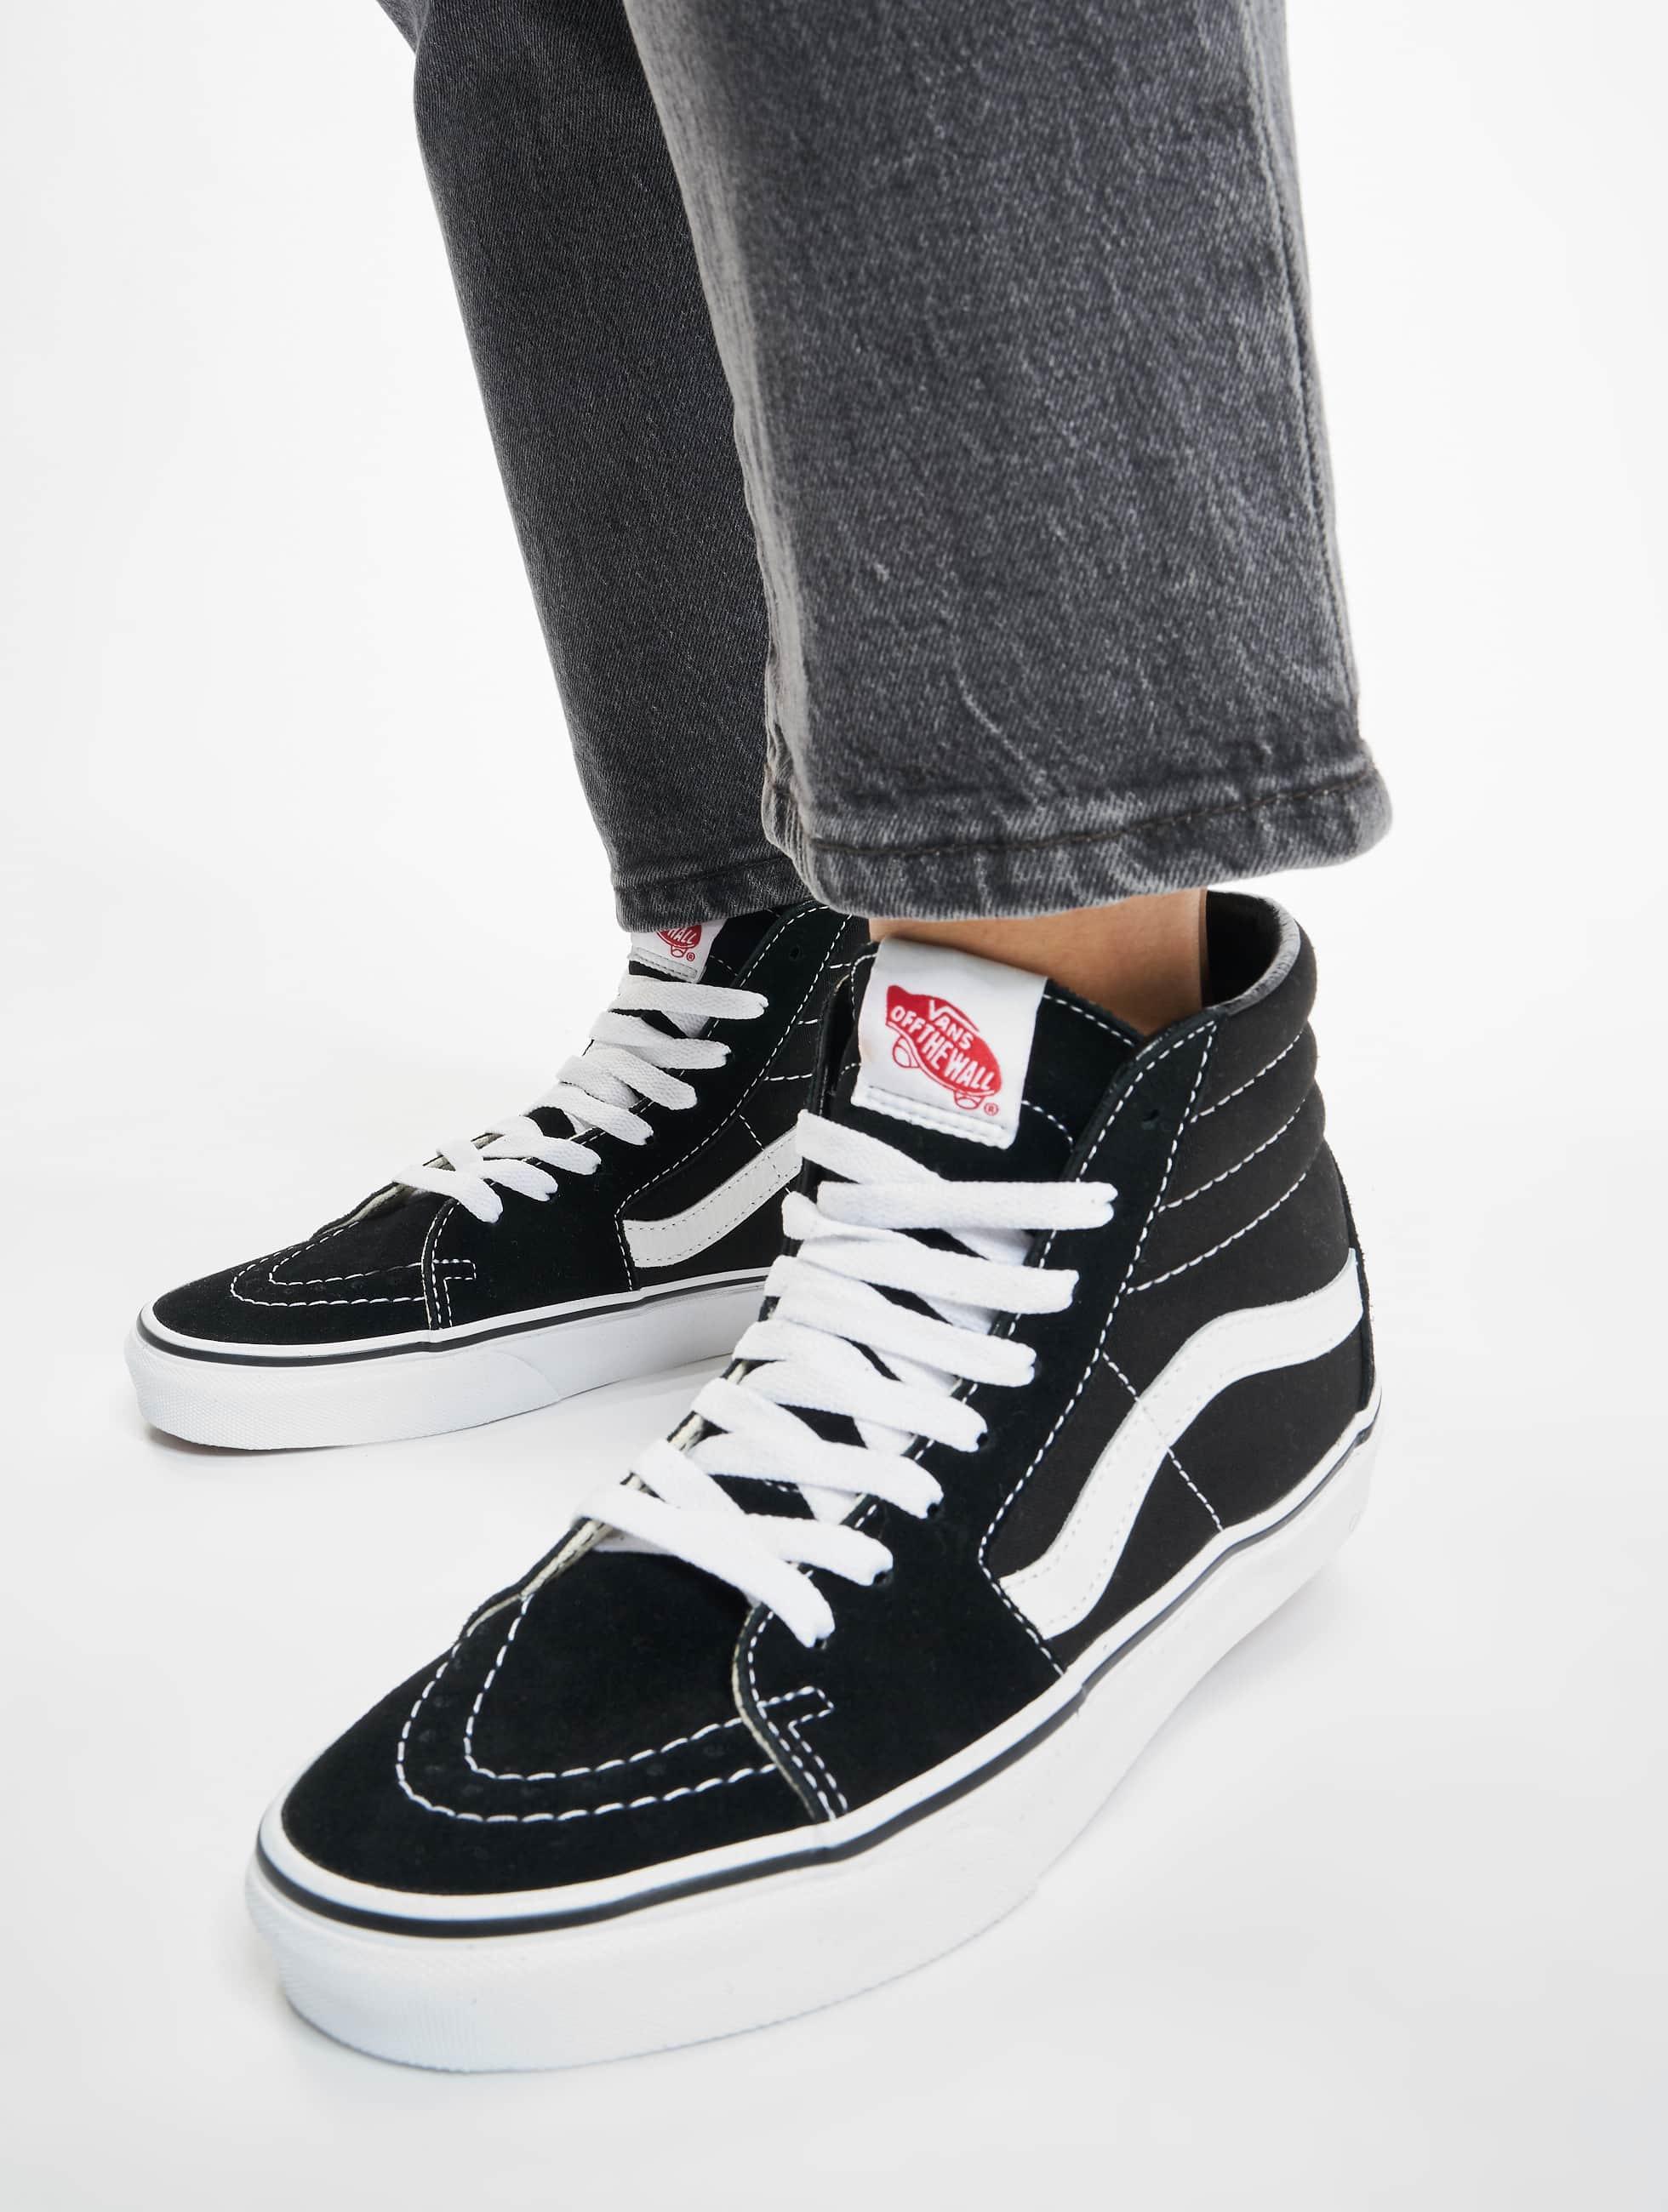 Vans Chaussures / Baskets Sk8-Hi en noir